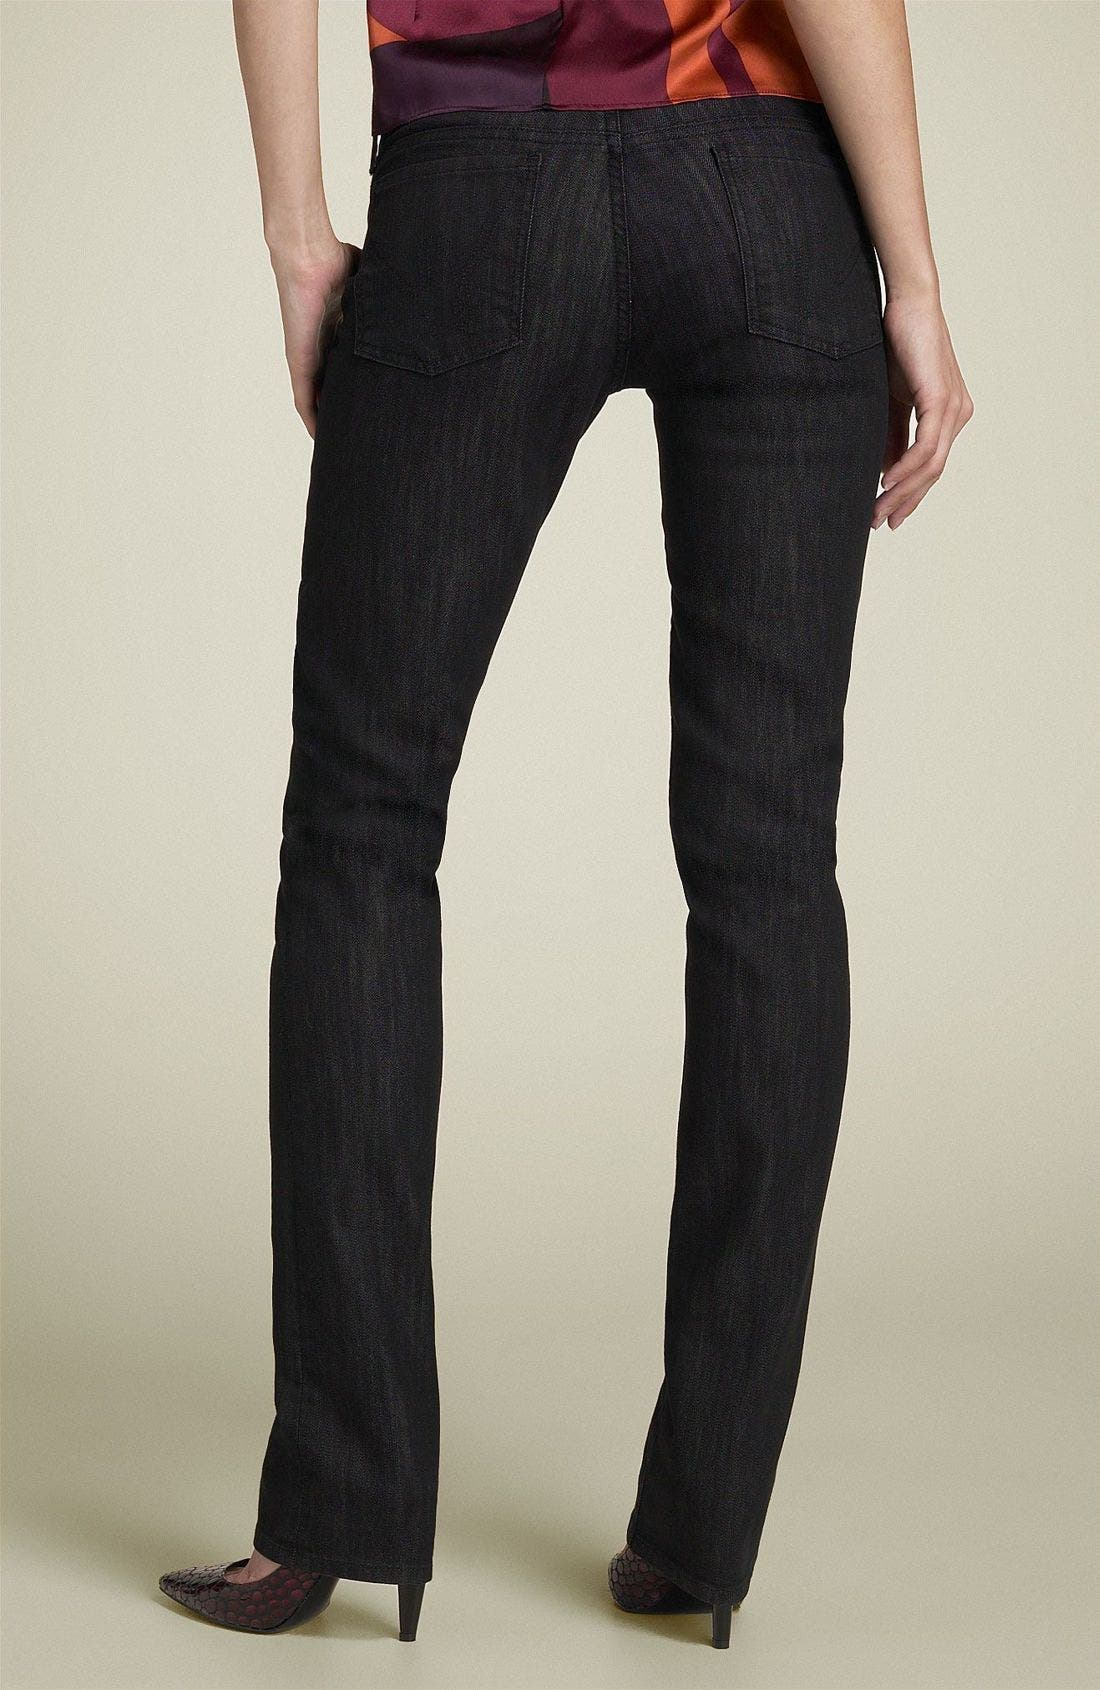 'Ava' Straight Leg Stretch Jeans,                             Main thumbnail 1, color,                             007